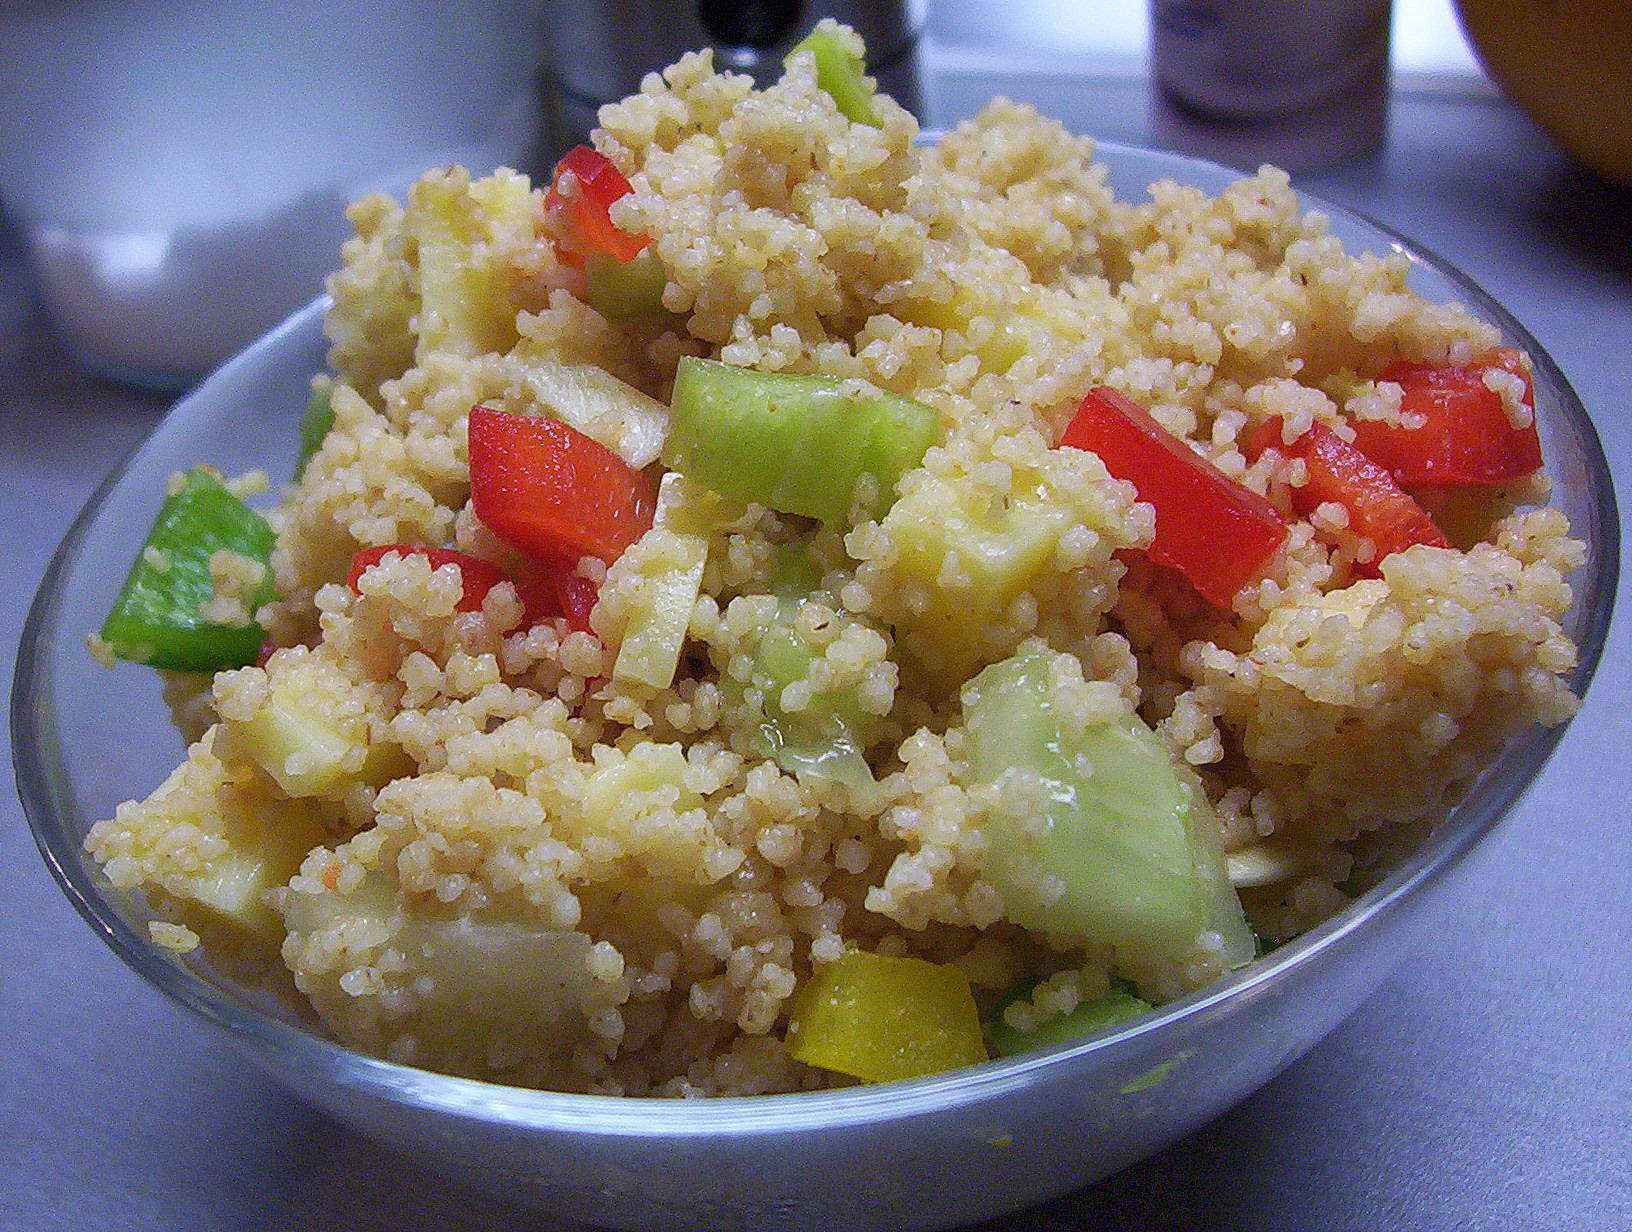 Fotografie receptu: Celozrnný kuskus se zeleninou a sýrem